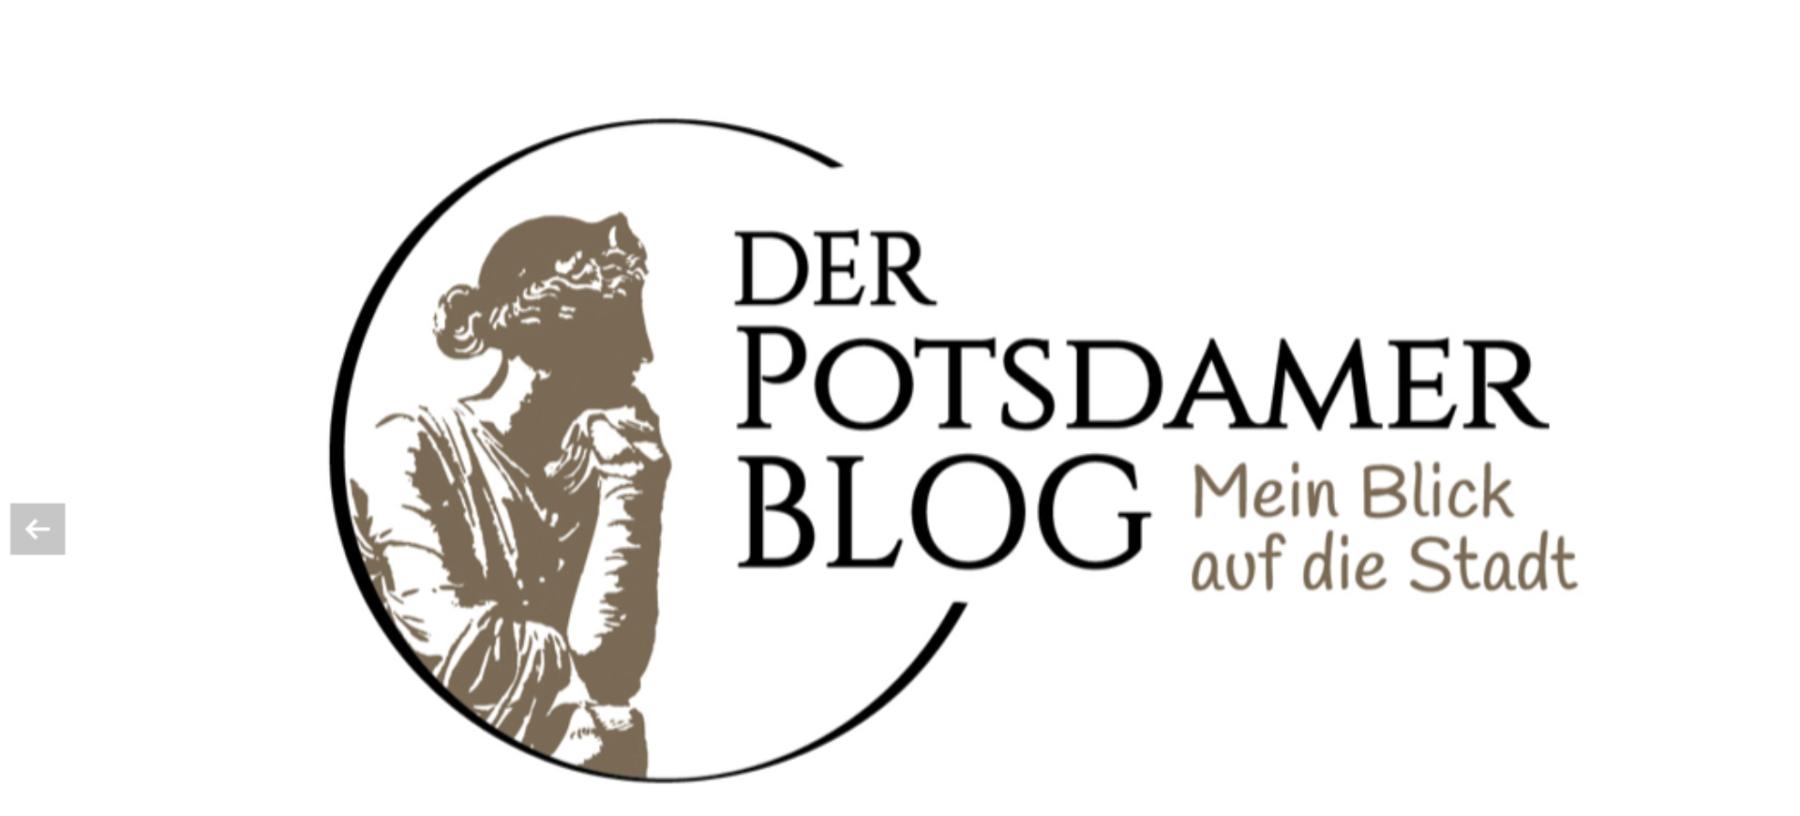 Potsdamer Fotospots